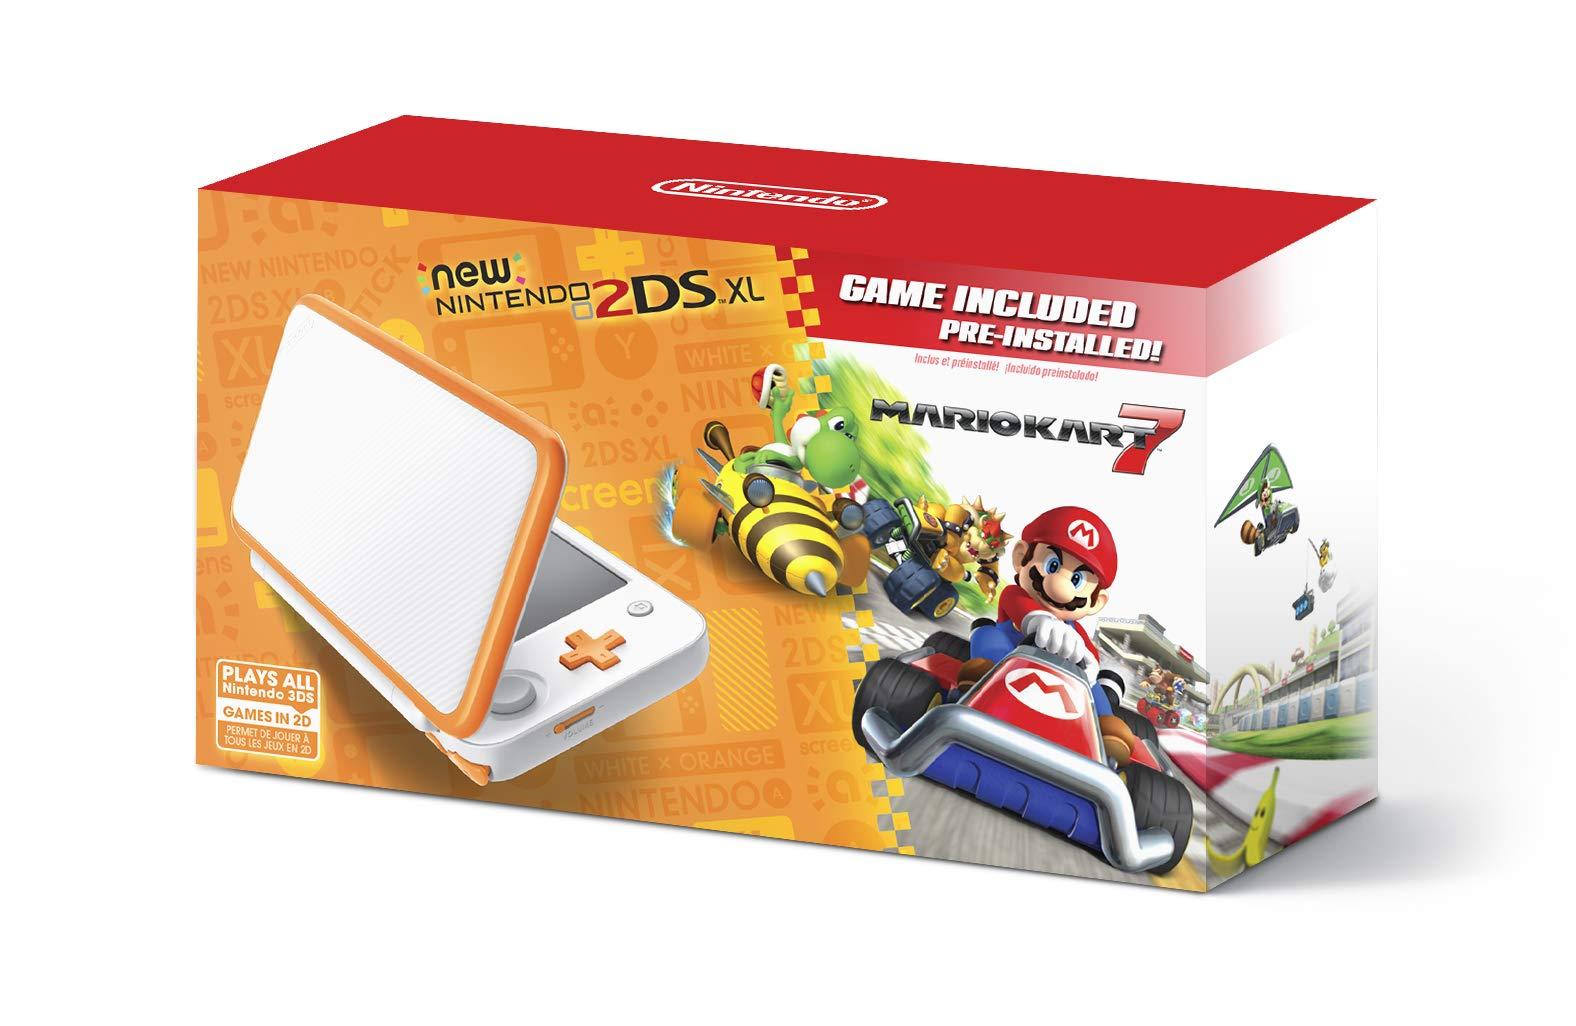 New Nintendo 2DS XL Handheld Game Console - Orange + White With Mario Kart 7 Pre-installed - Nintendo 2DS